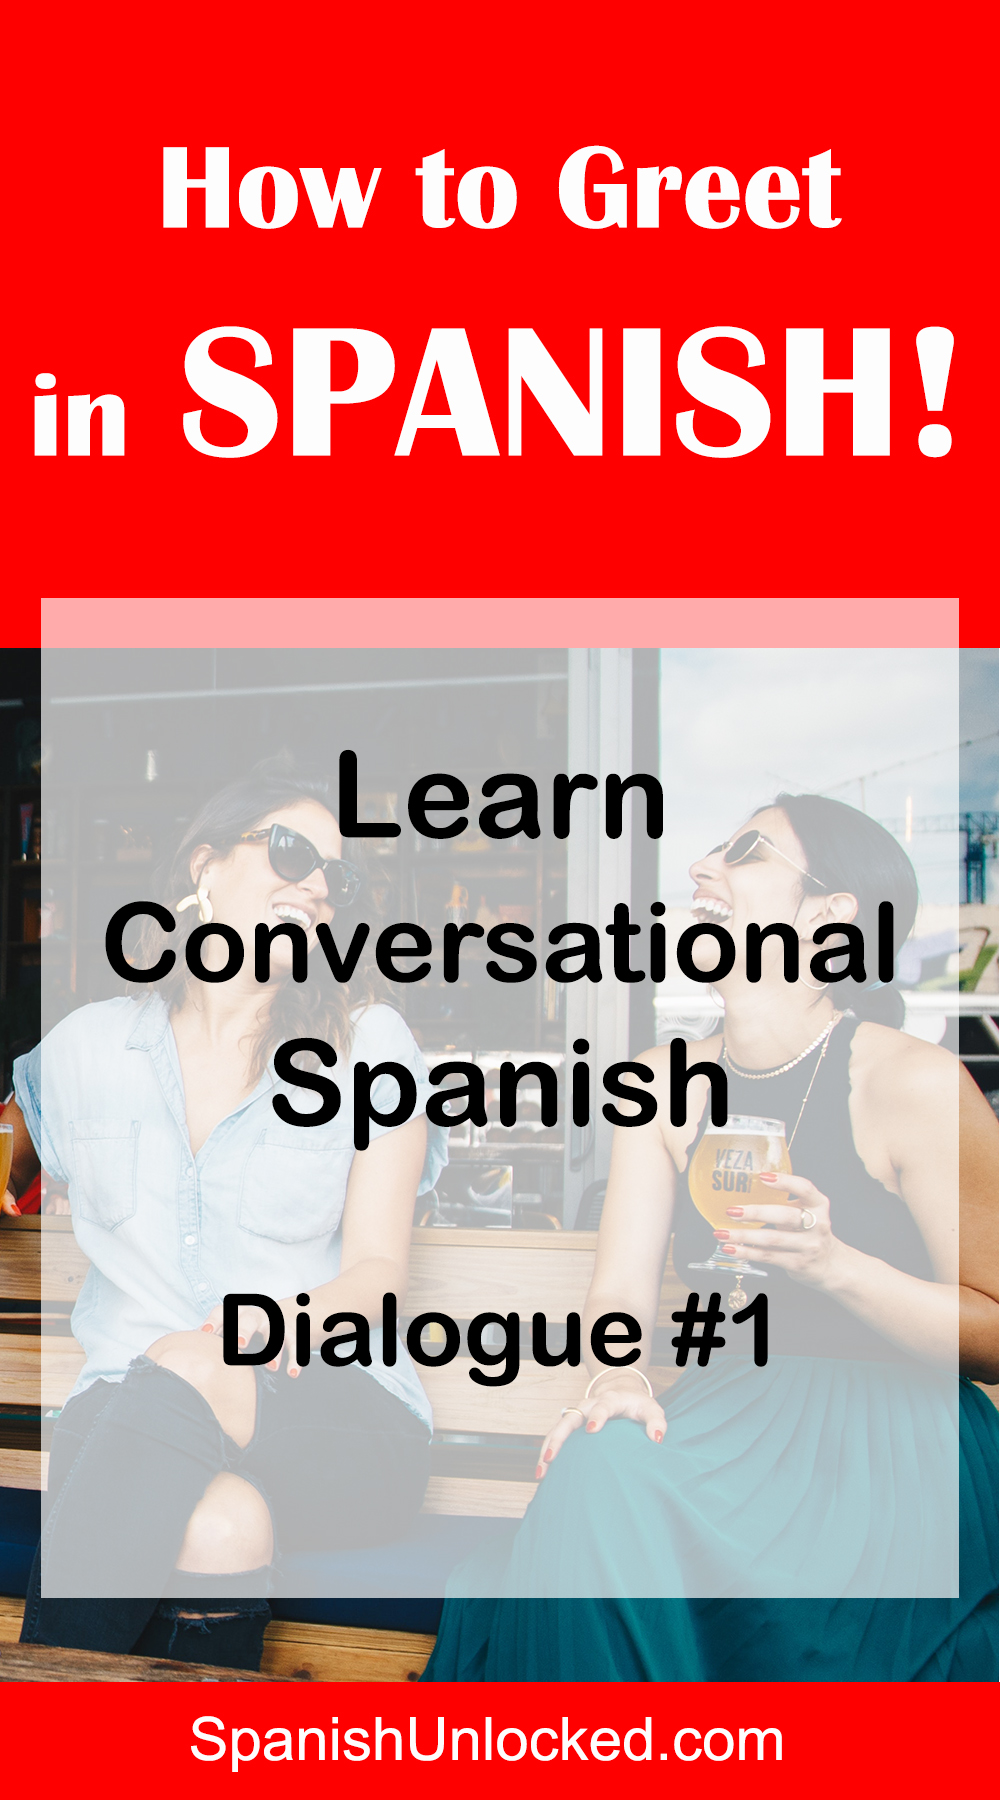 LEARN CONVERSATIONAL SPANISH | How to Greet in Spanish #learningspanish